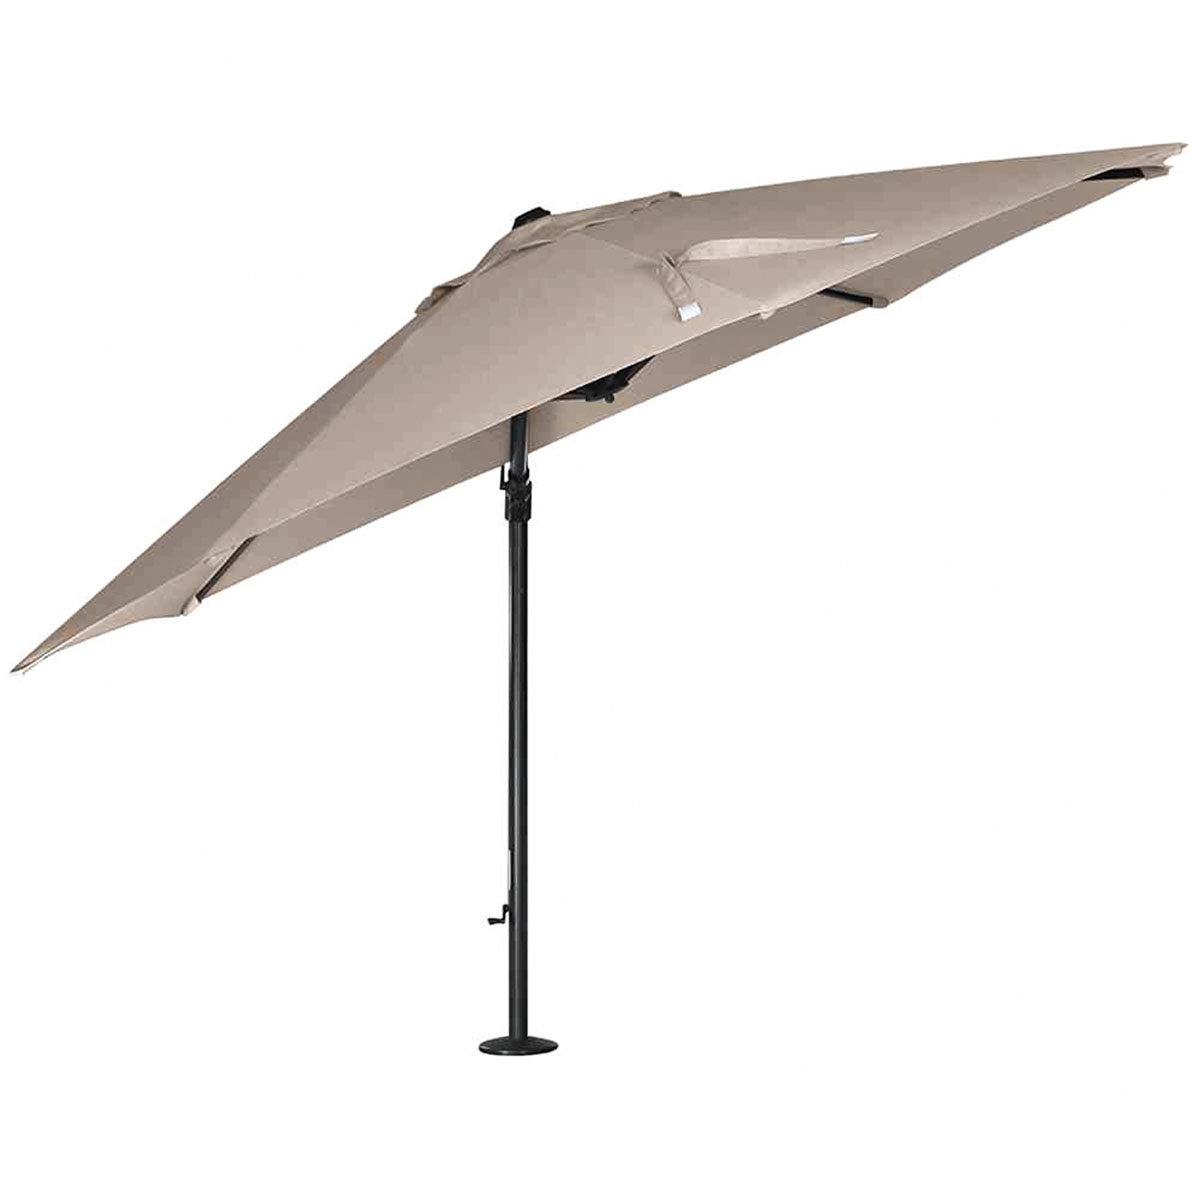 Sonnenschirm Alphawing N+ Ø 3,5 m, grau   #7